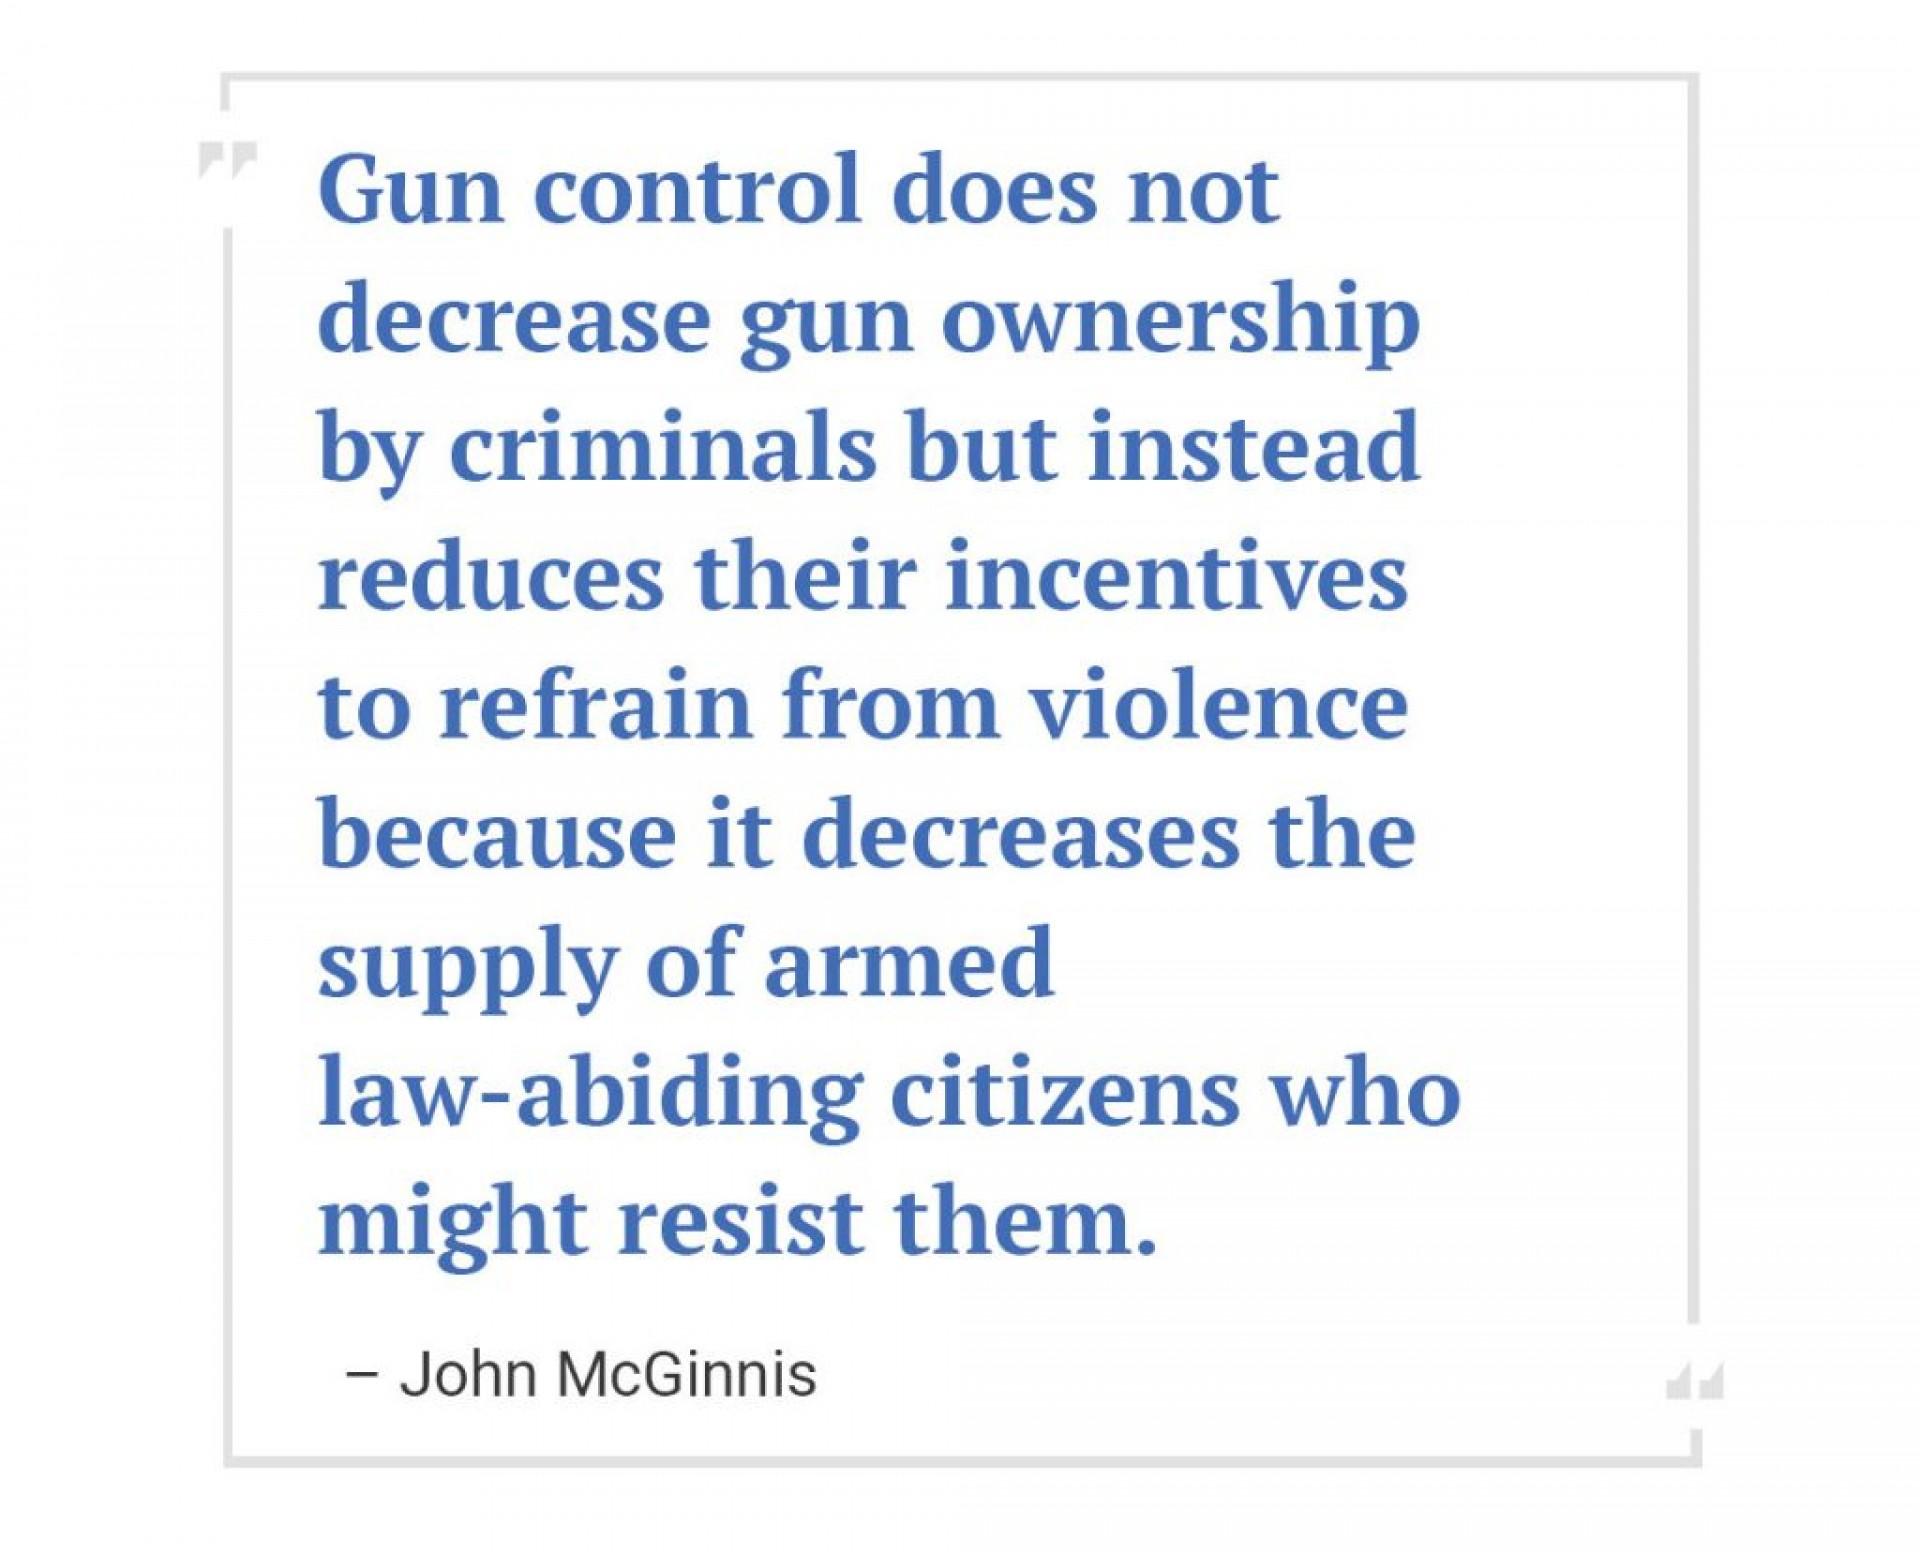 001 Essay Example On Gun Control John Mcginnis Incredible Pdf Laws Essays Stricter 1920